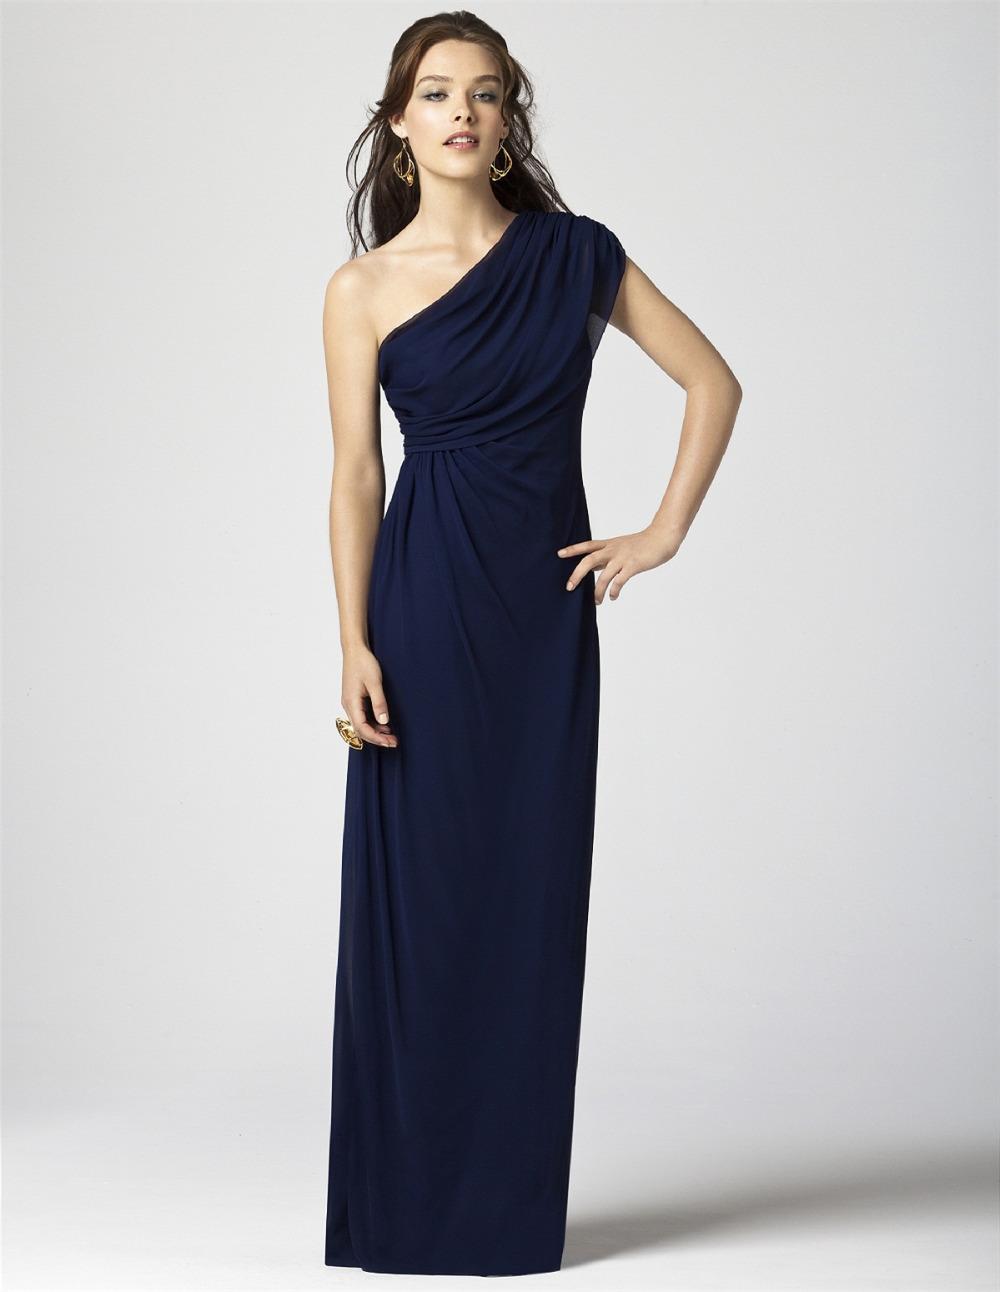 Navy blue long plus size chiffon elie saab evening dress ...